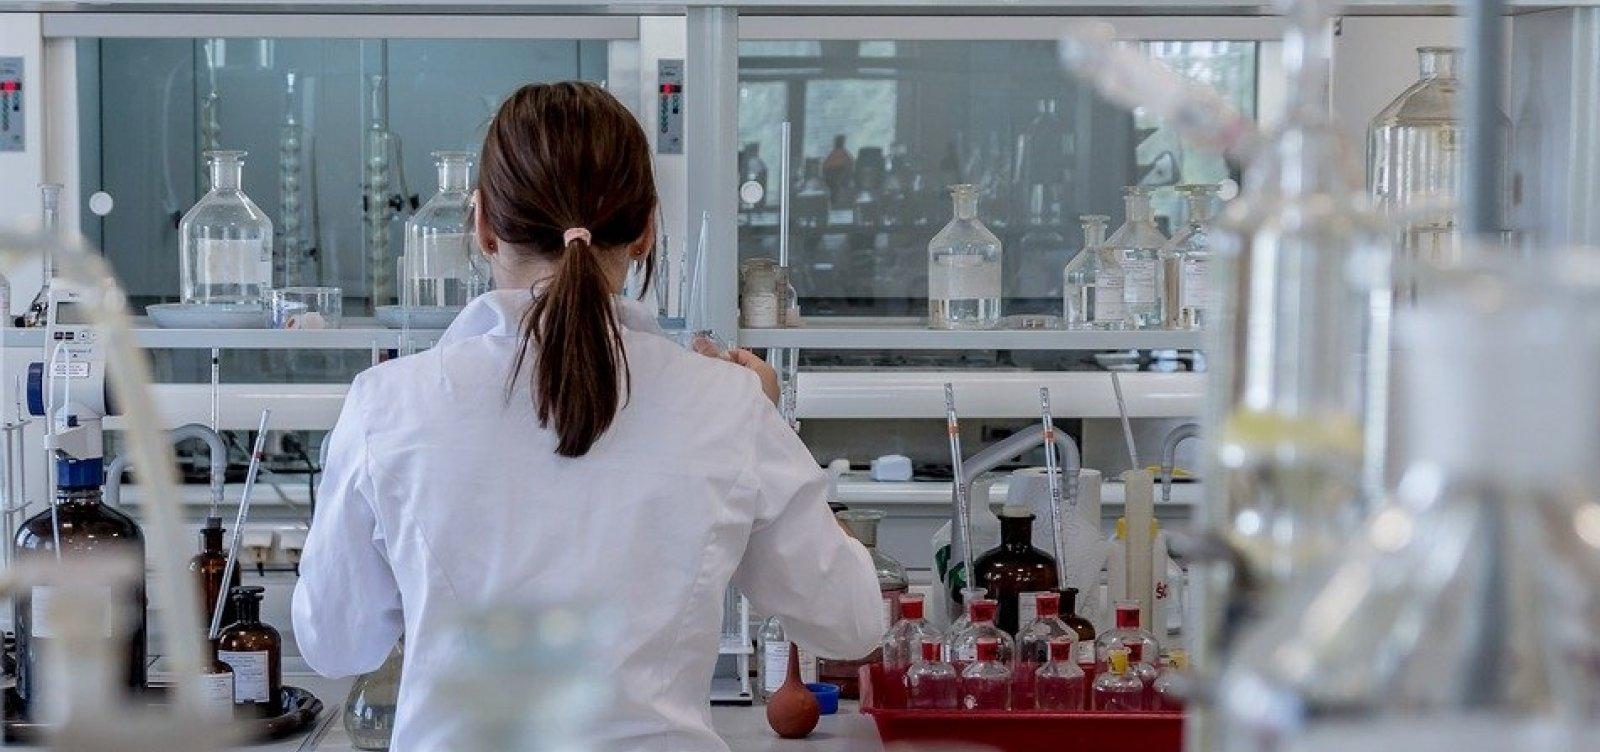 Vírus 'primo' da chikungunya é descoberto na UFRJ